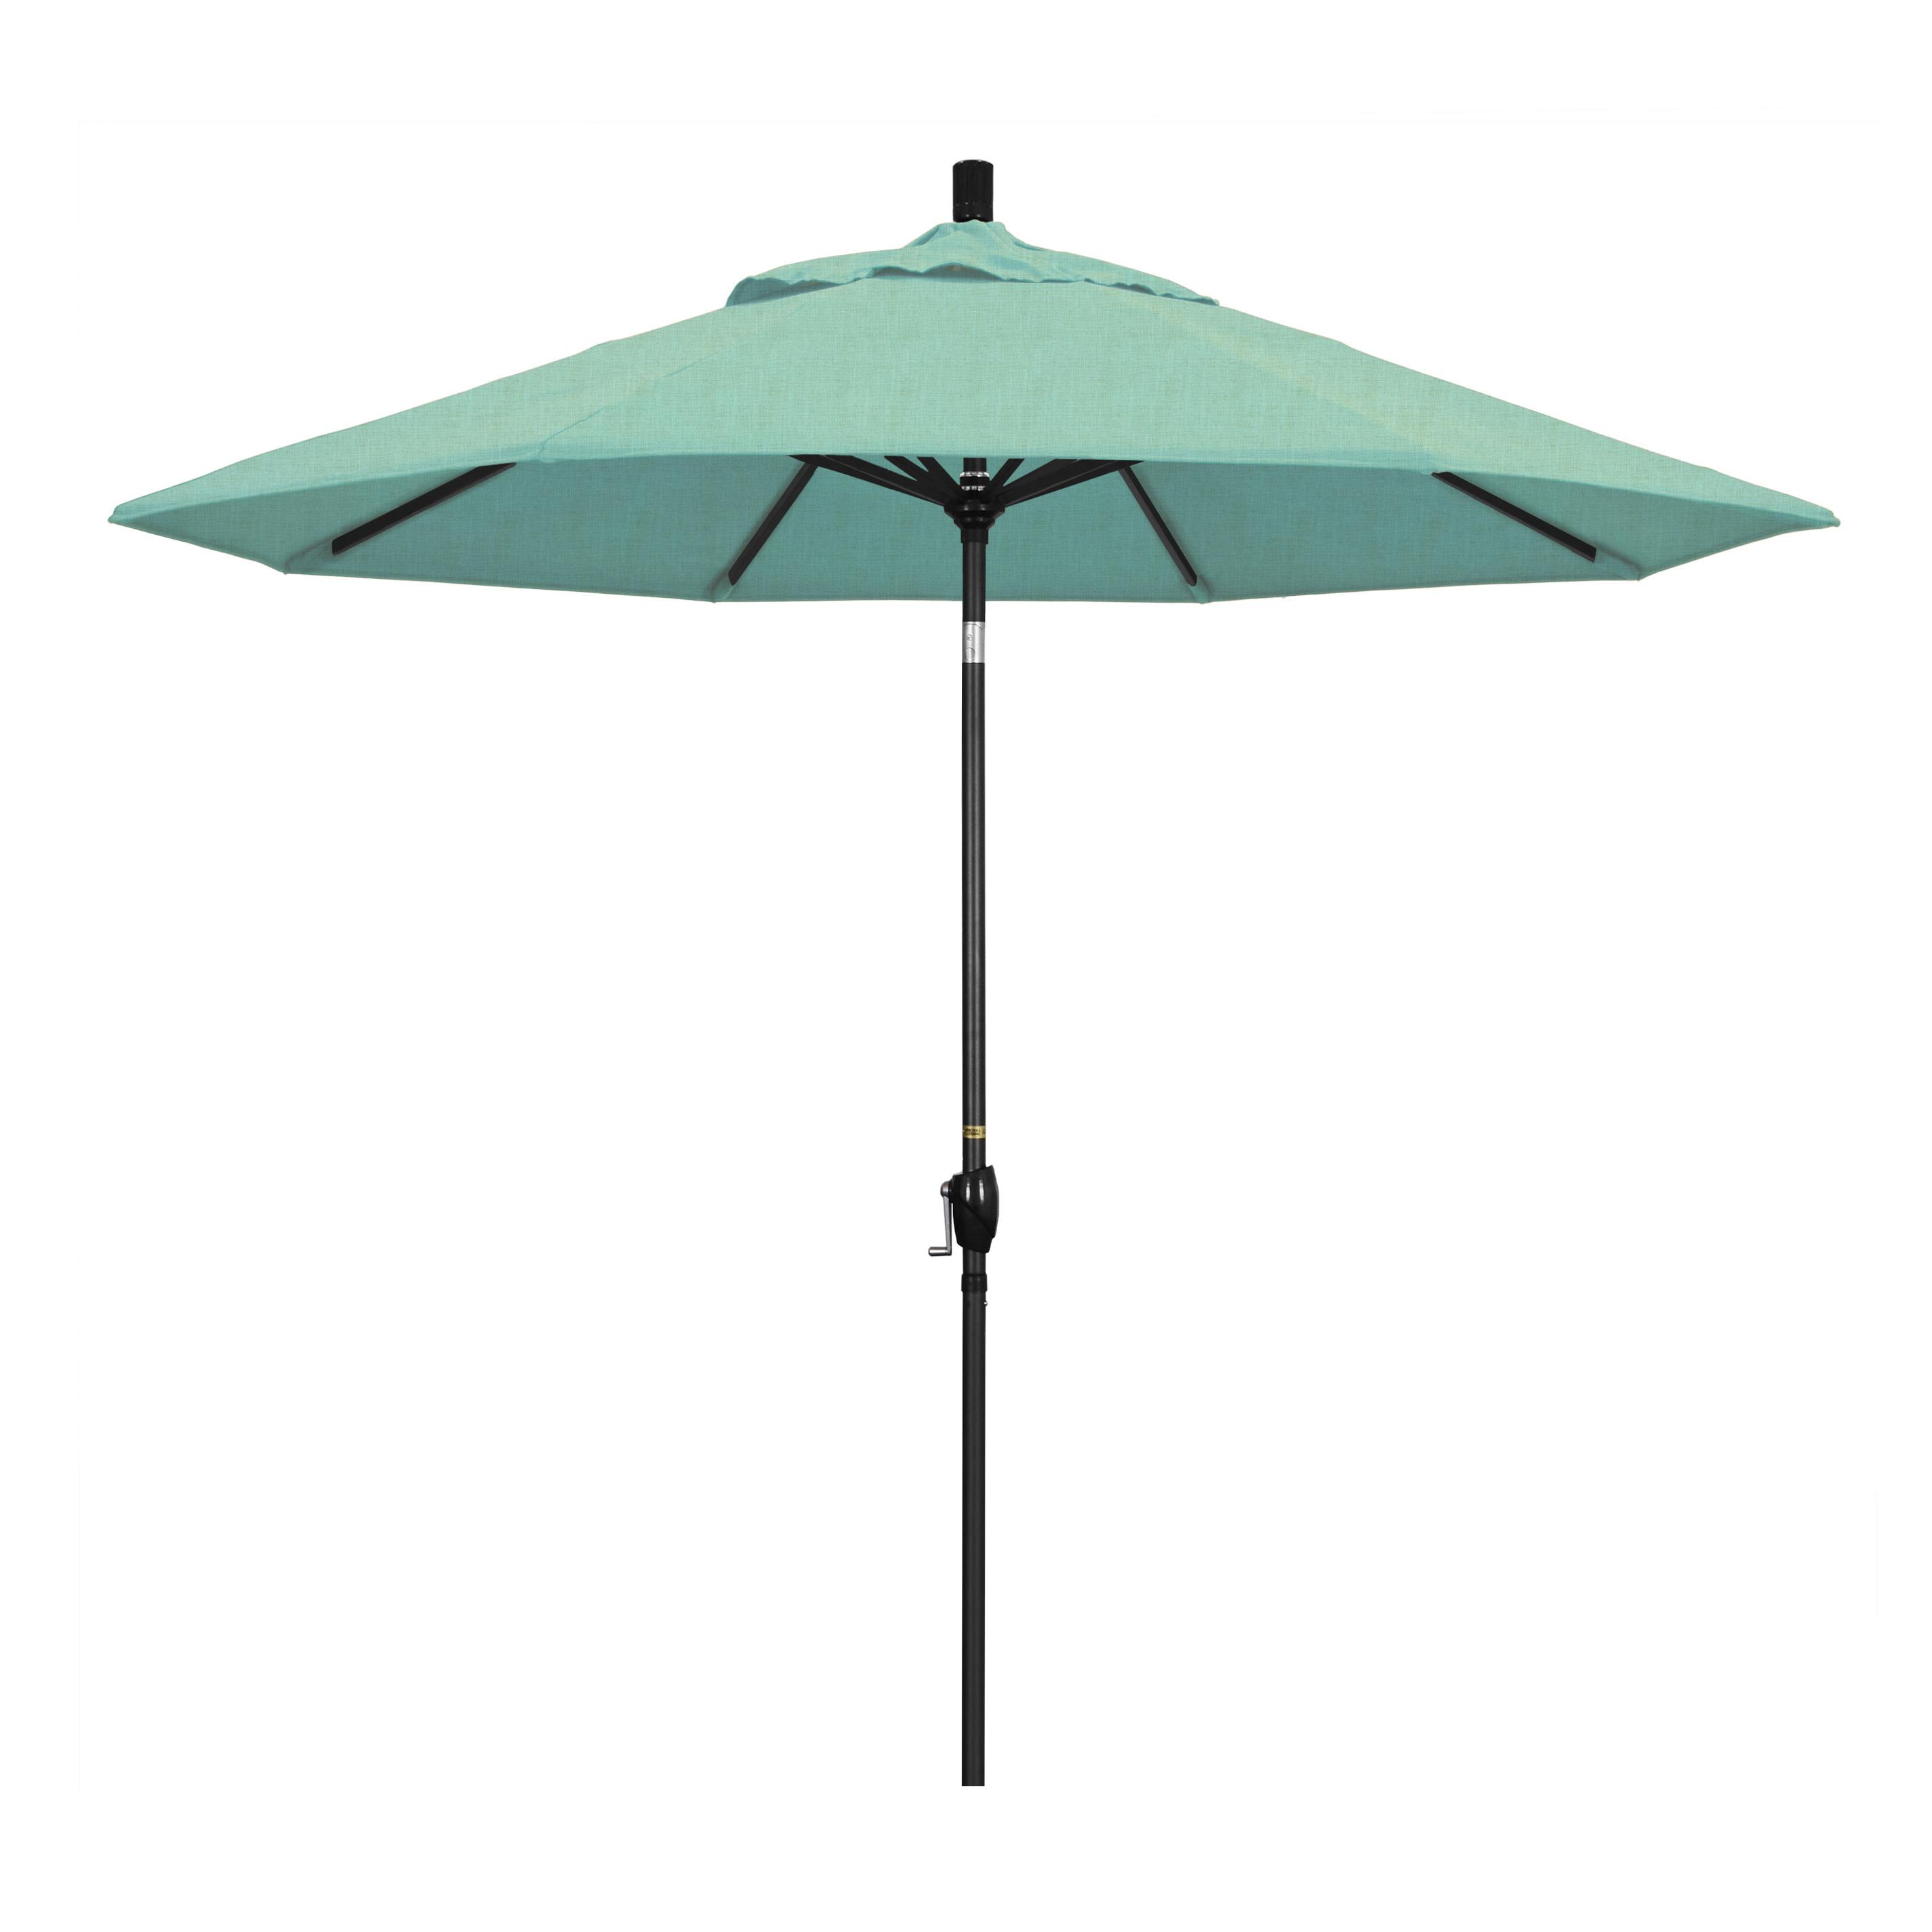 9' Market Umbrella In Famous Market Umbrellas (View 15 of 20)